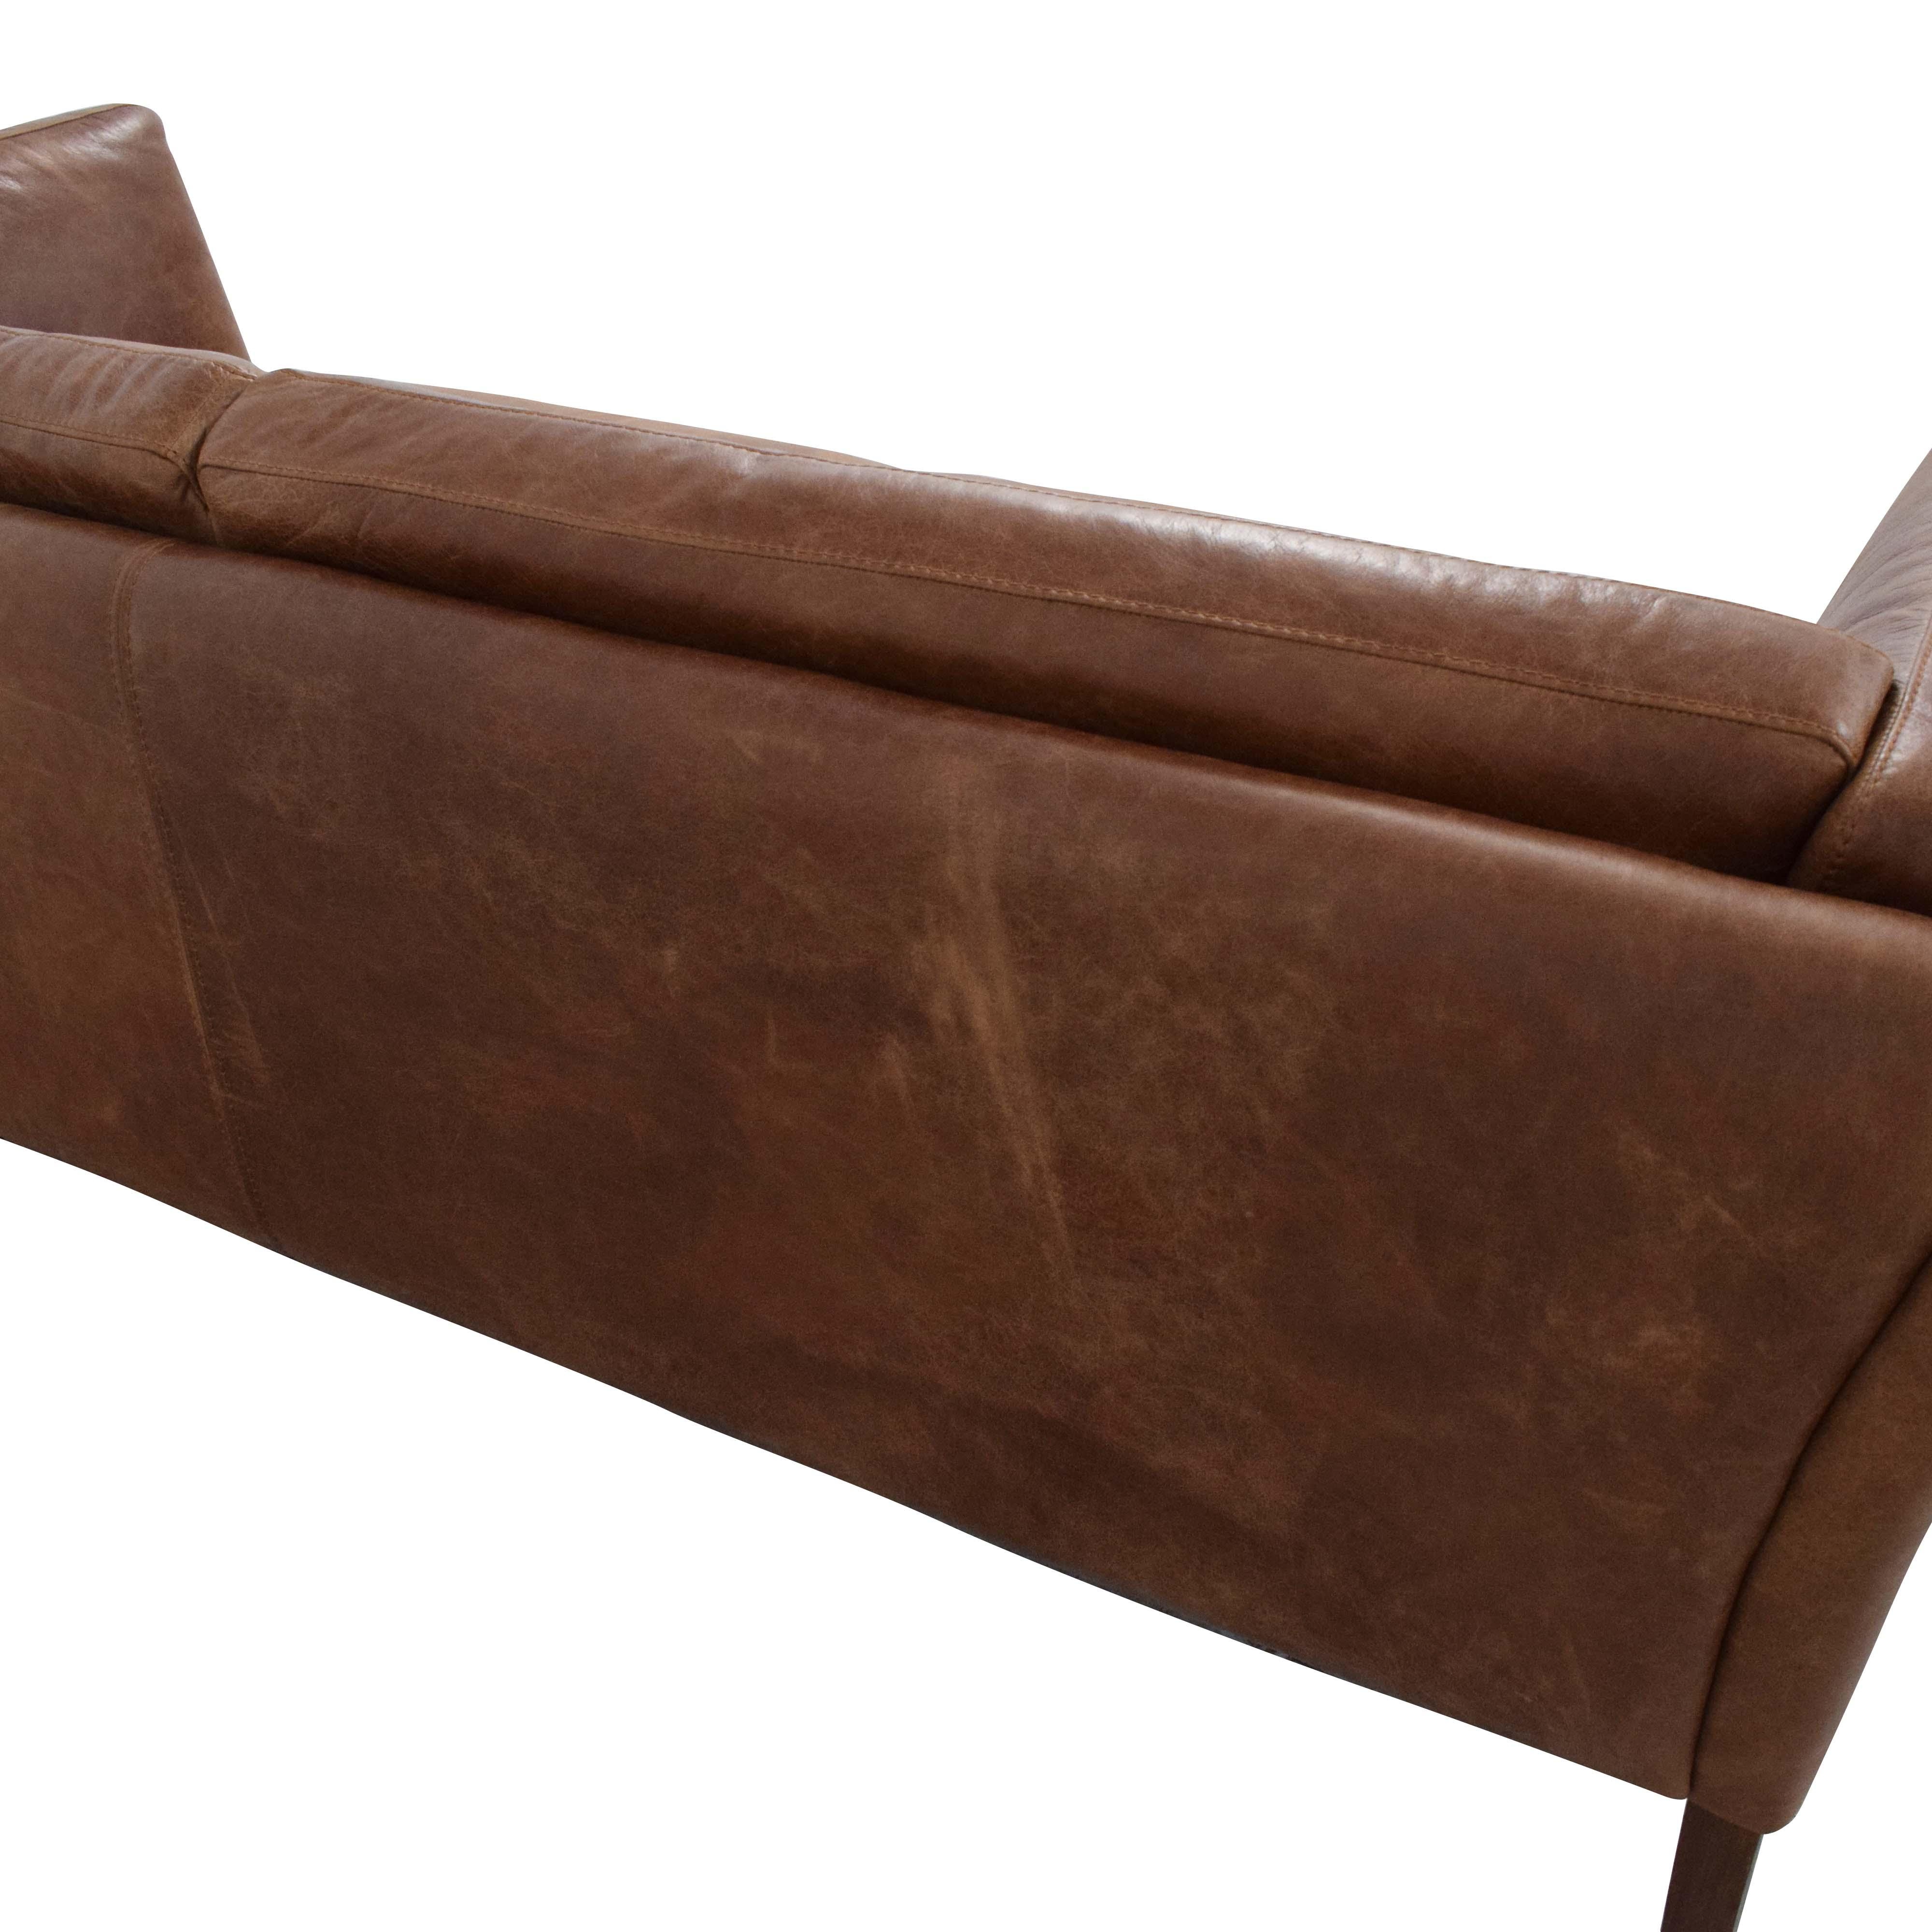 Bench Cushion Sofa nyc